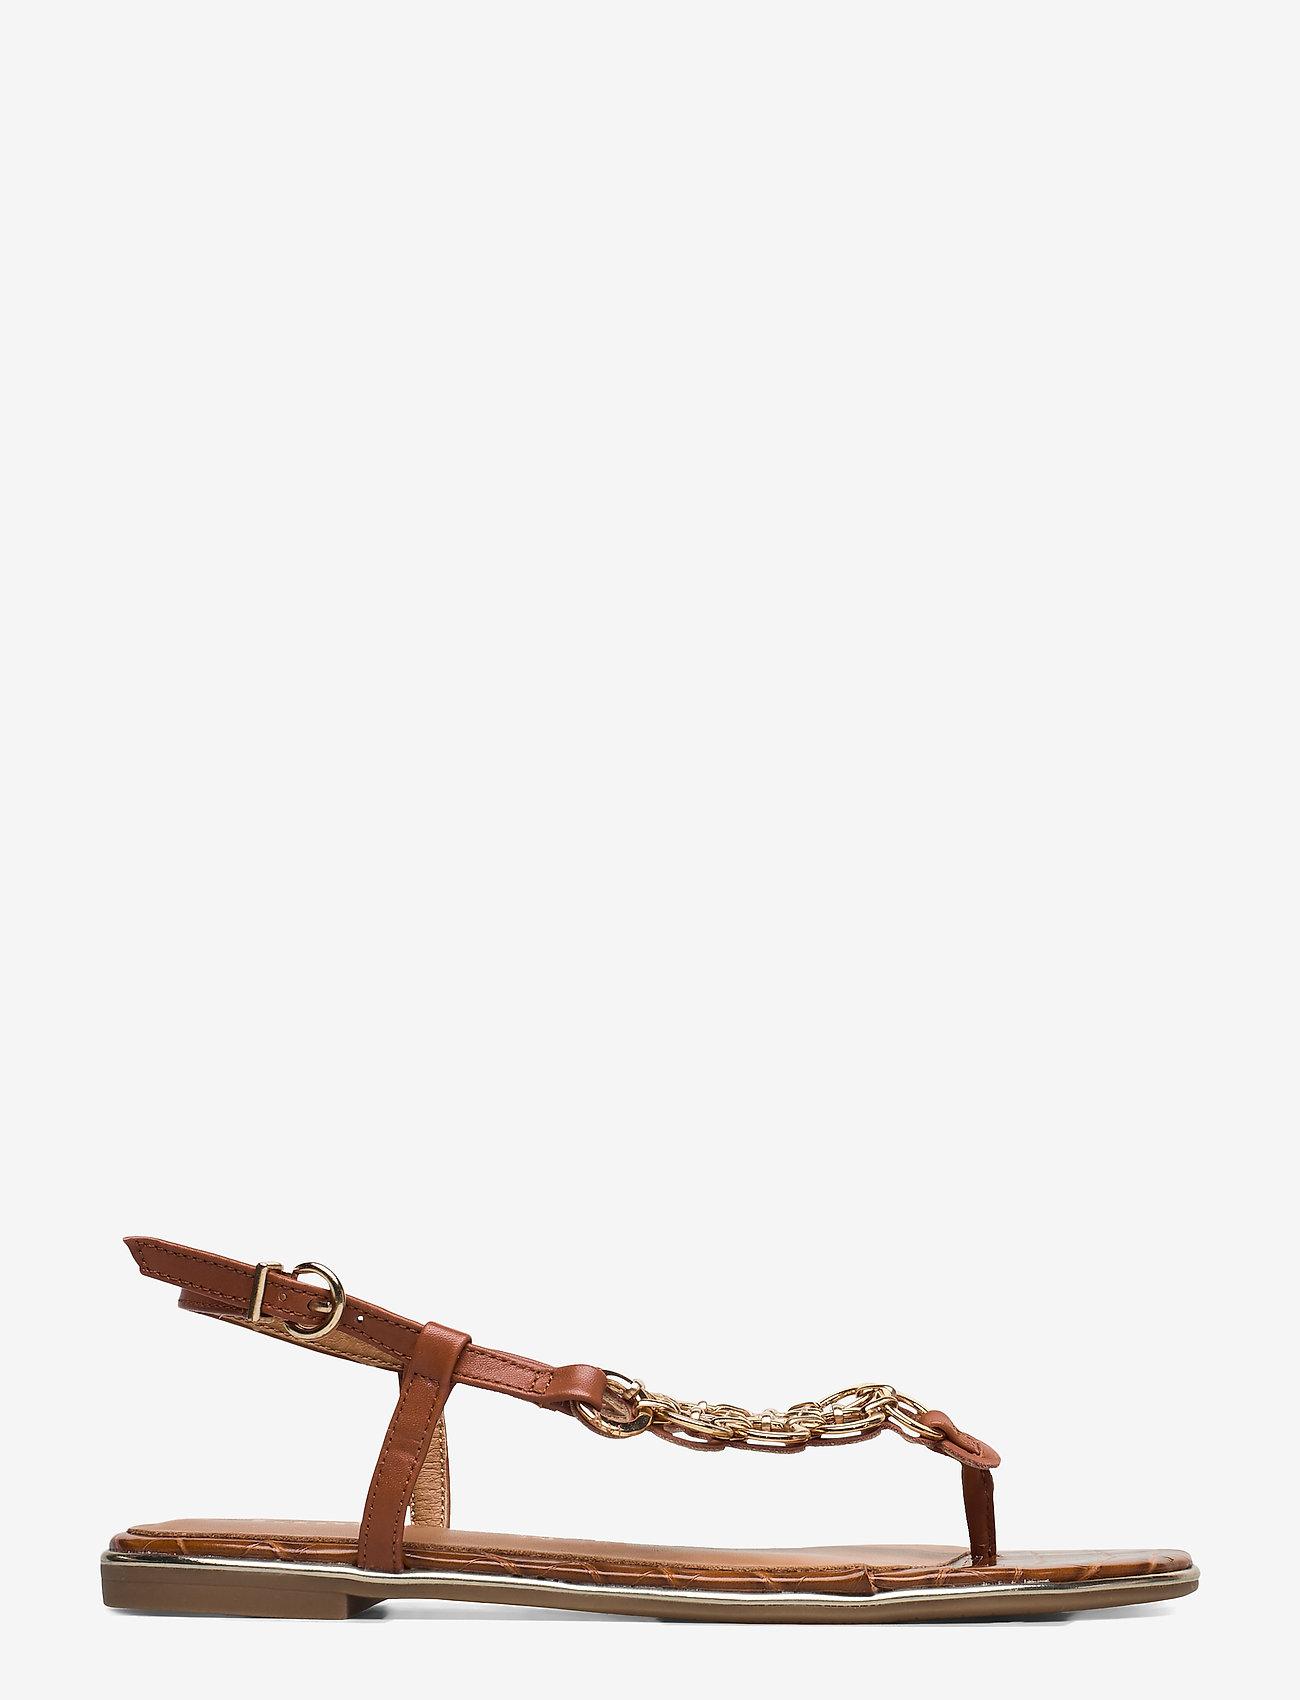 Woms Sandals (Brandy) - Tamaris opRNoy